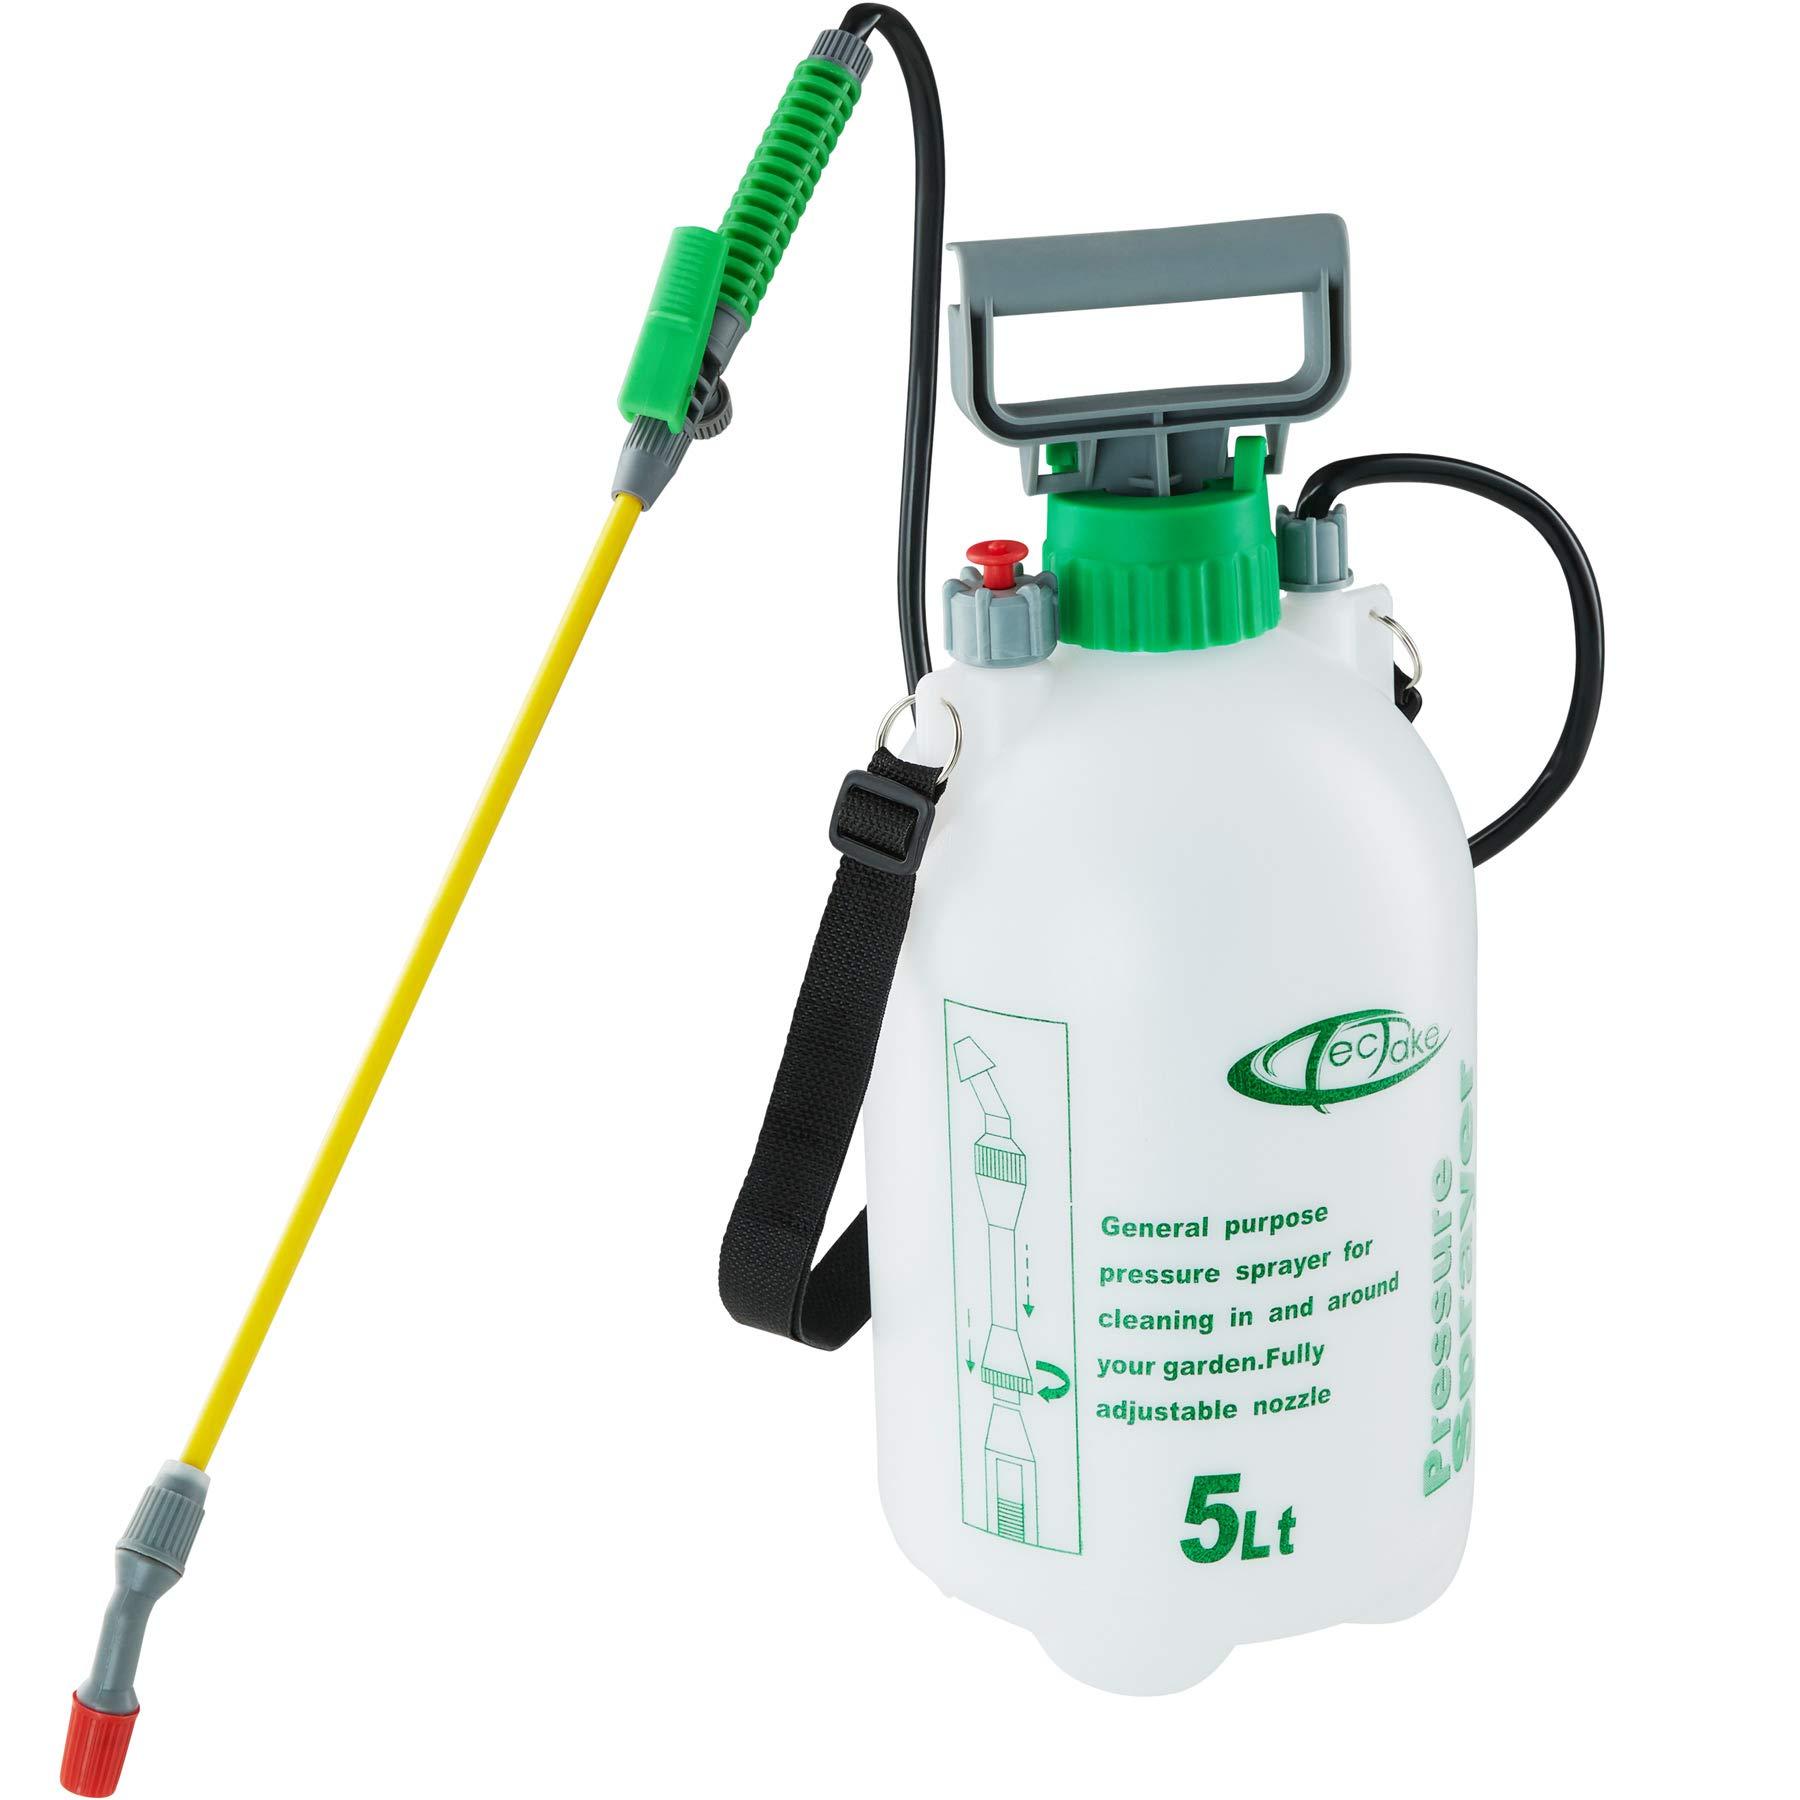 TecTake 402574 - Pulverizador a presión 5 litros, Rociador a presión, Lanza Fumigador: Amazon.es: Productos para mascotas